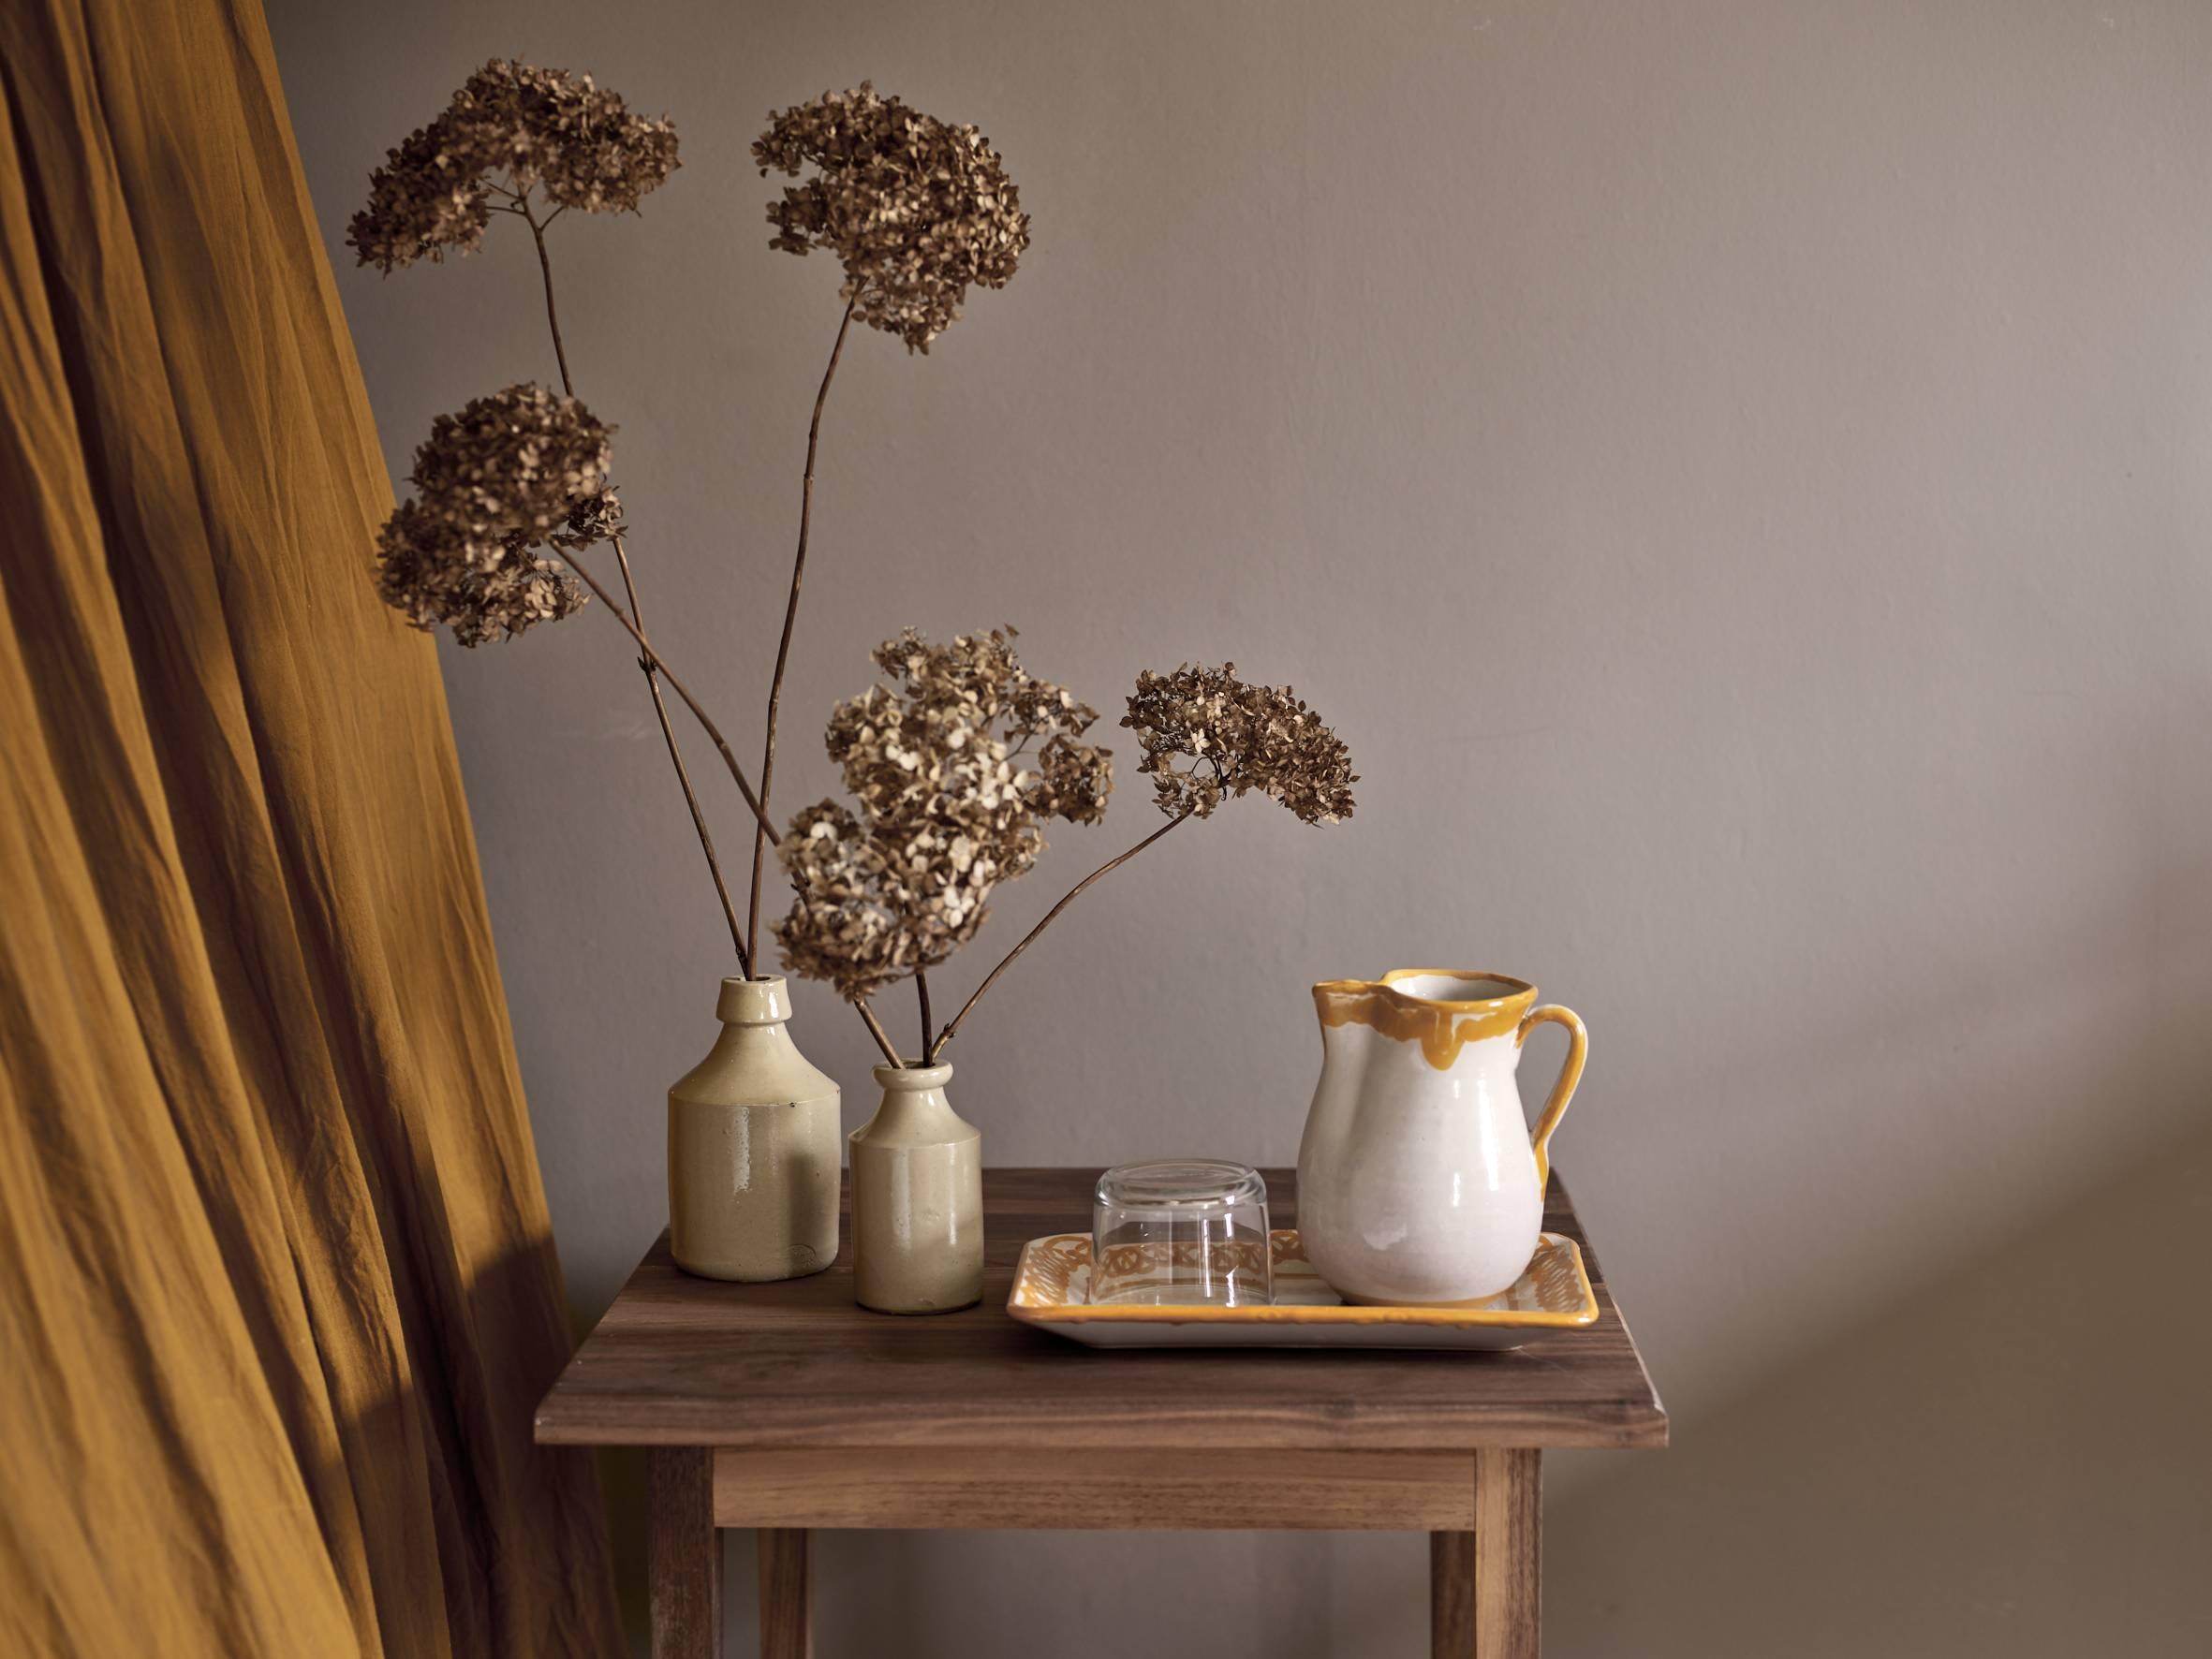 The WoodEdit bedside table in Walnut.